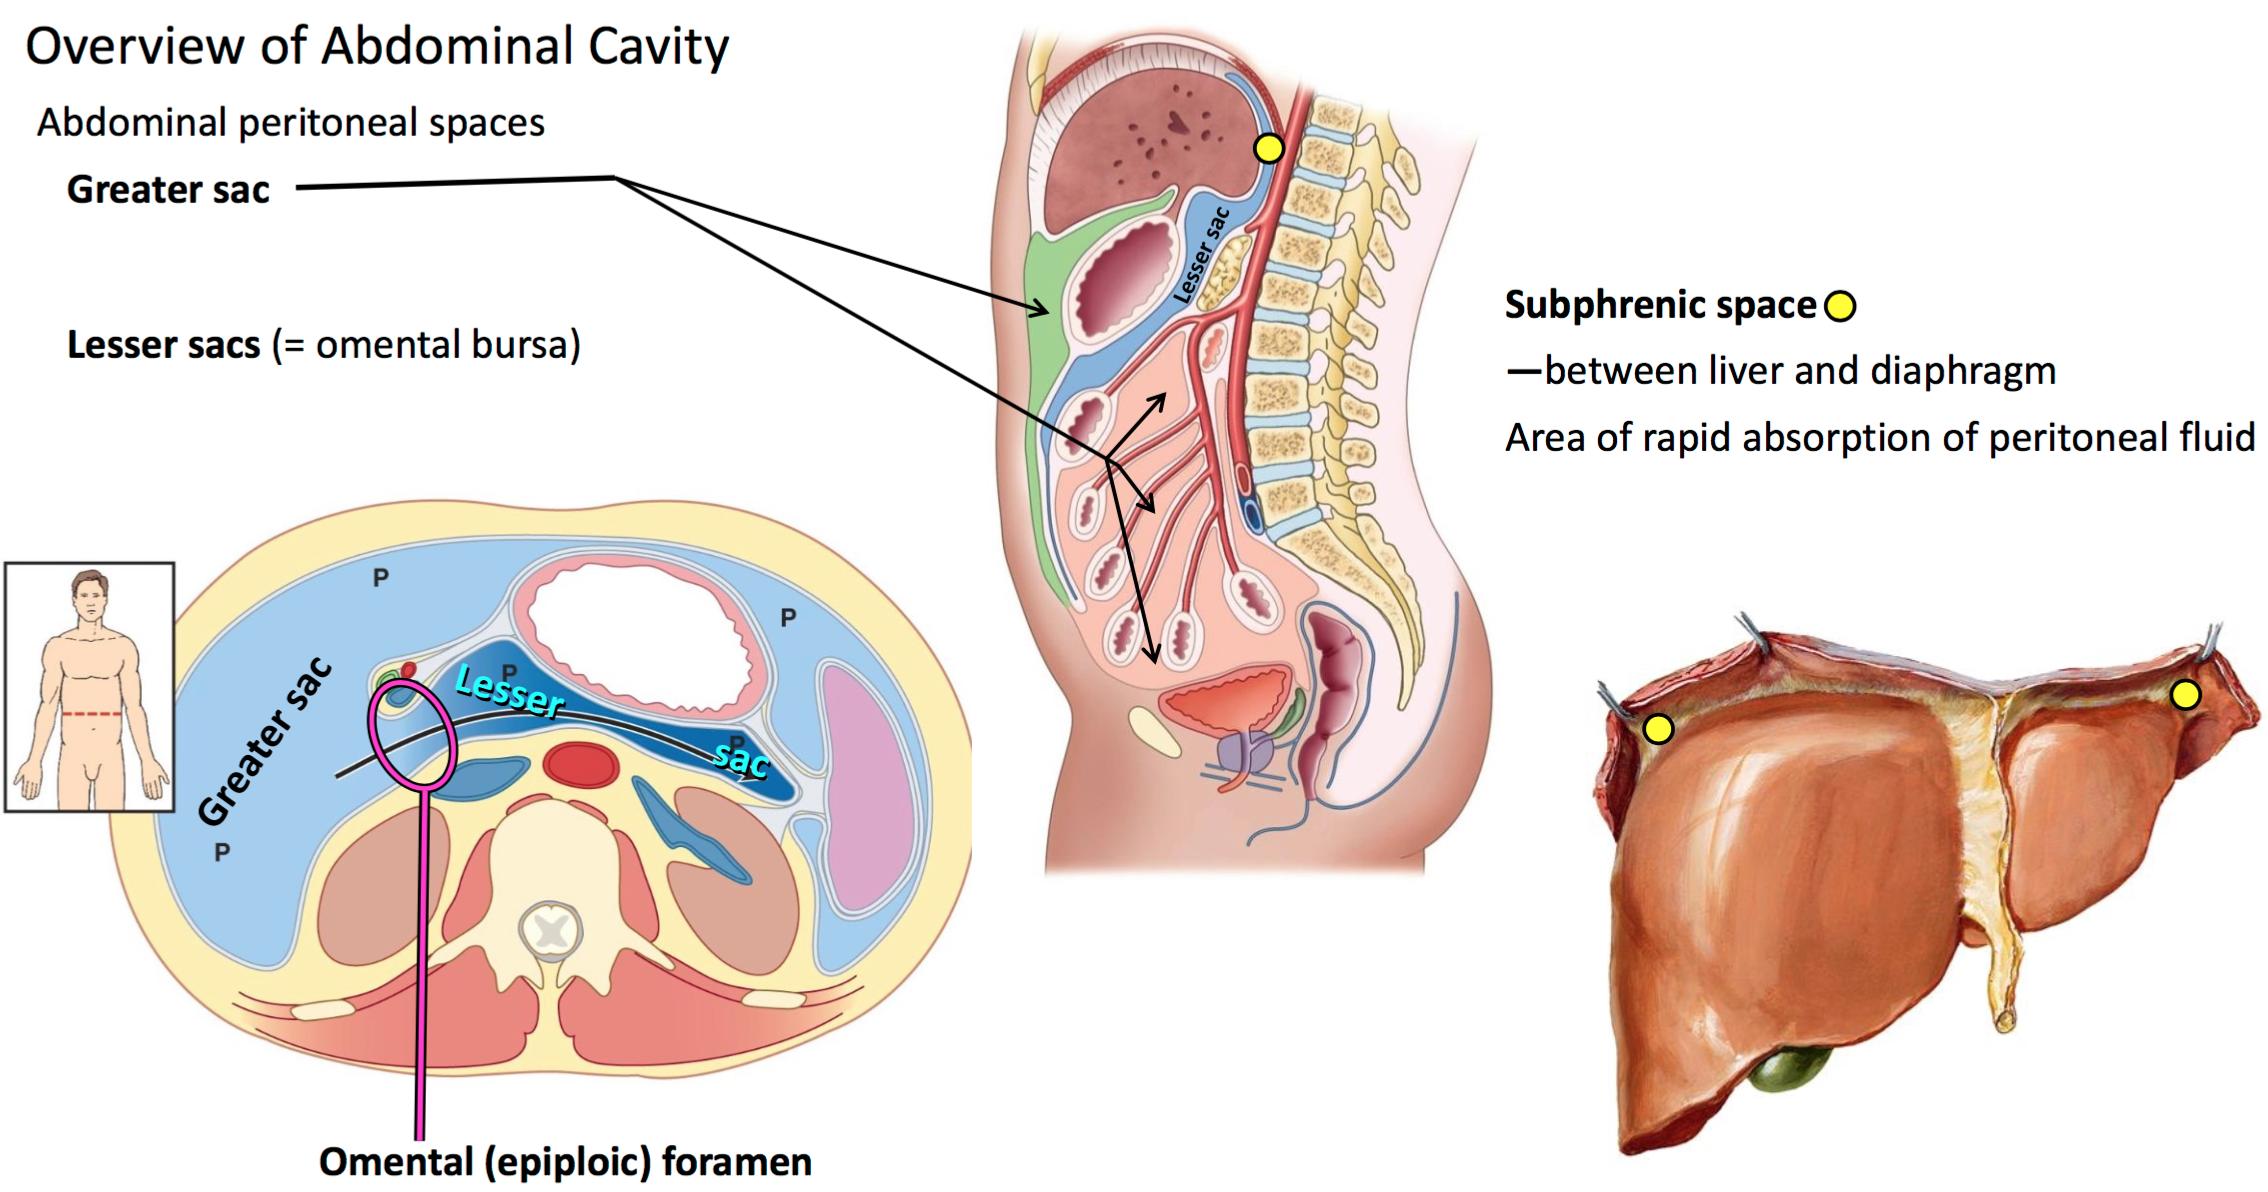 Enchanting Stomach Cavity Anatomy Ideas - Human Anatomy Images ...